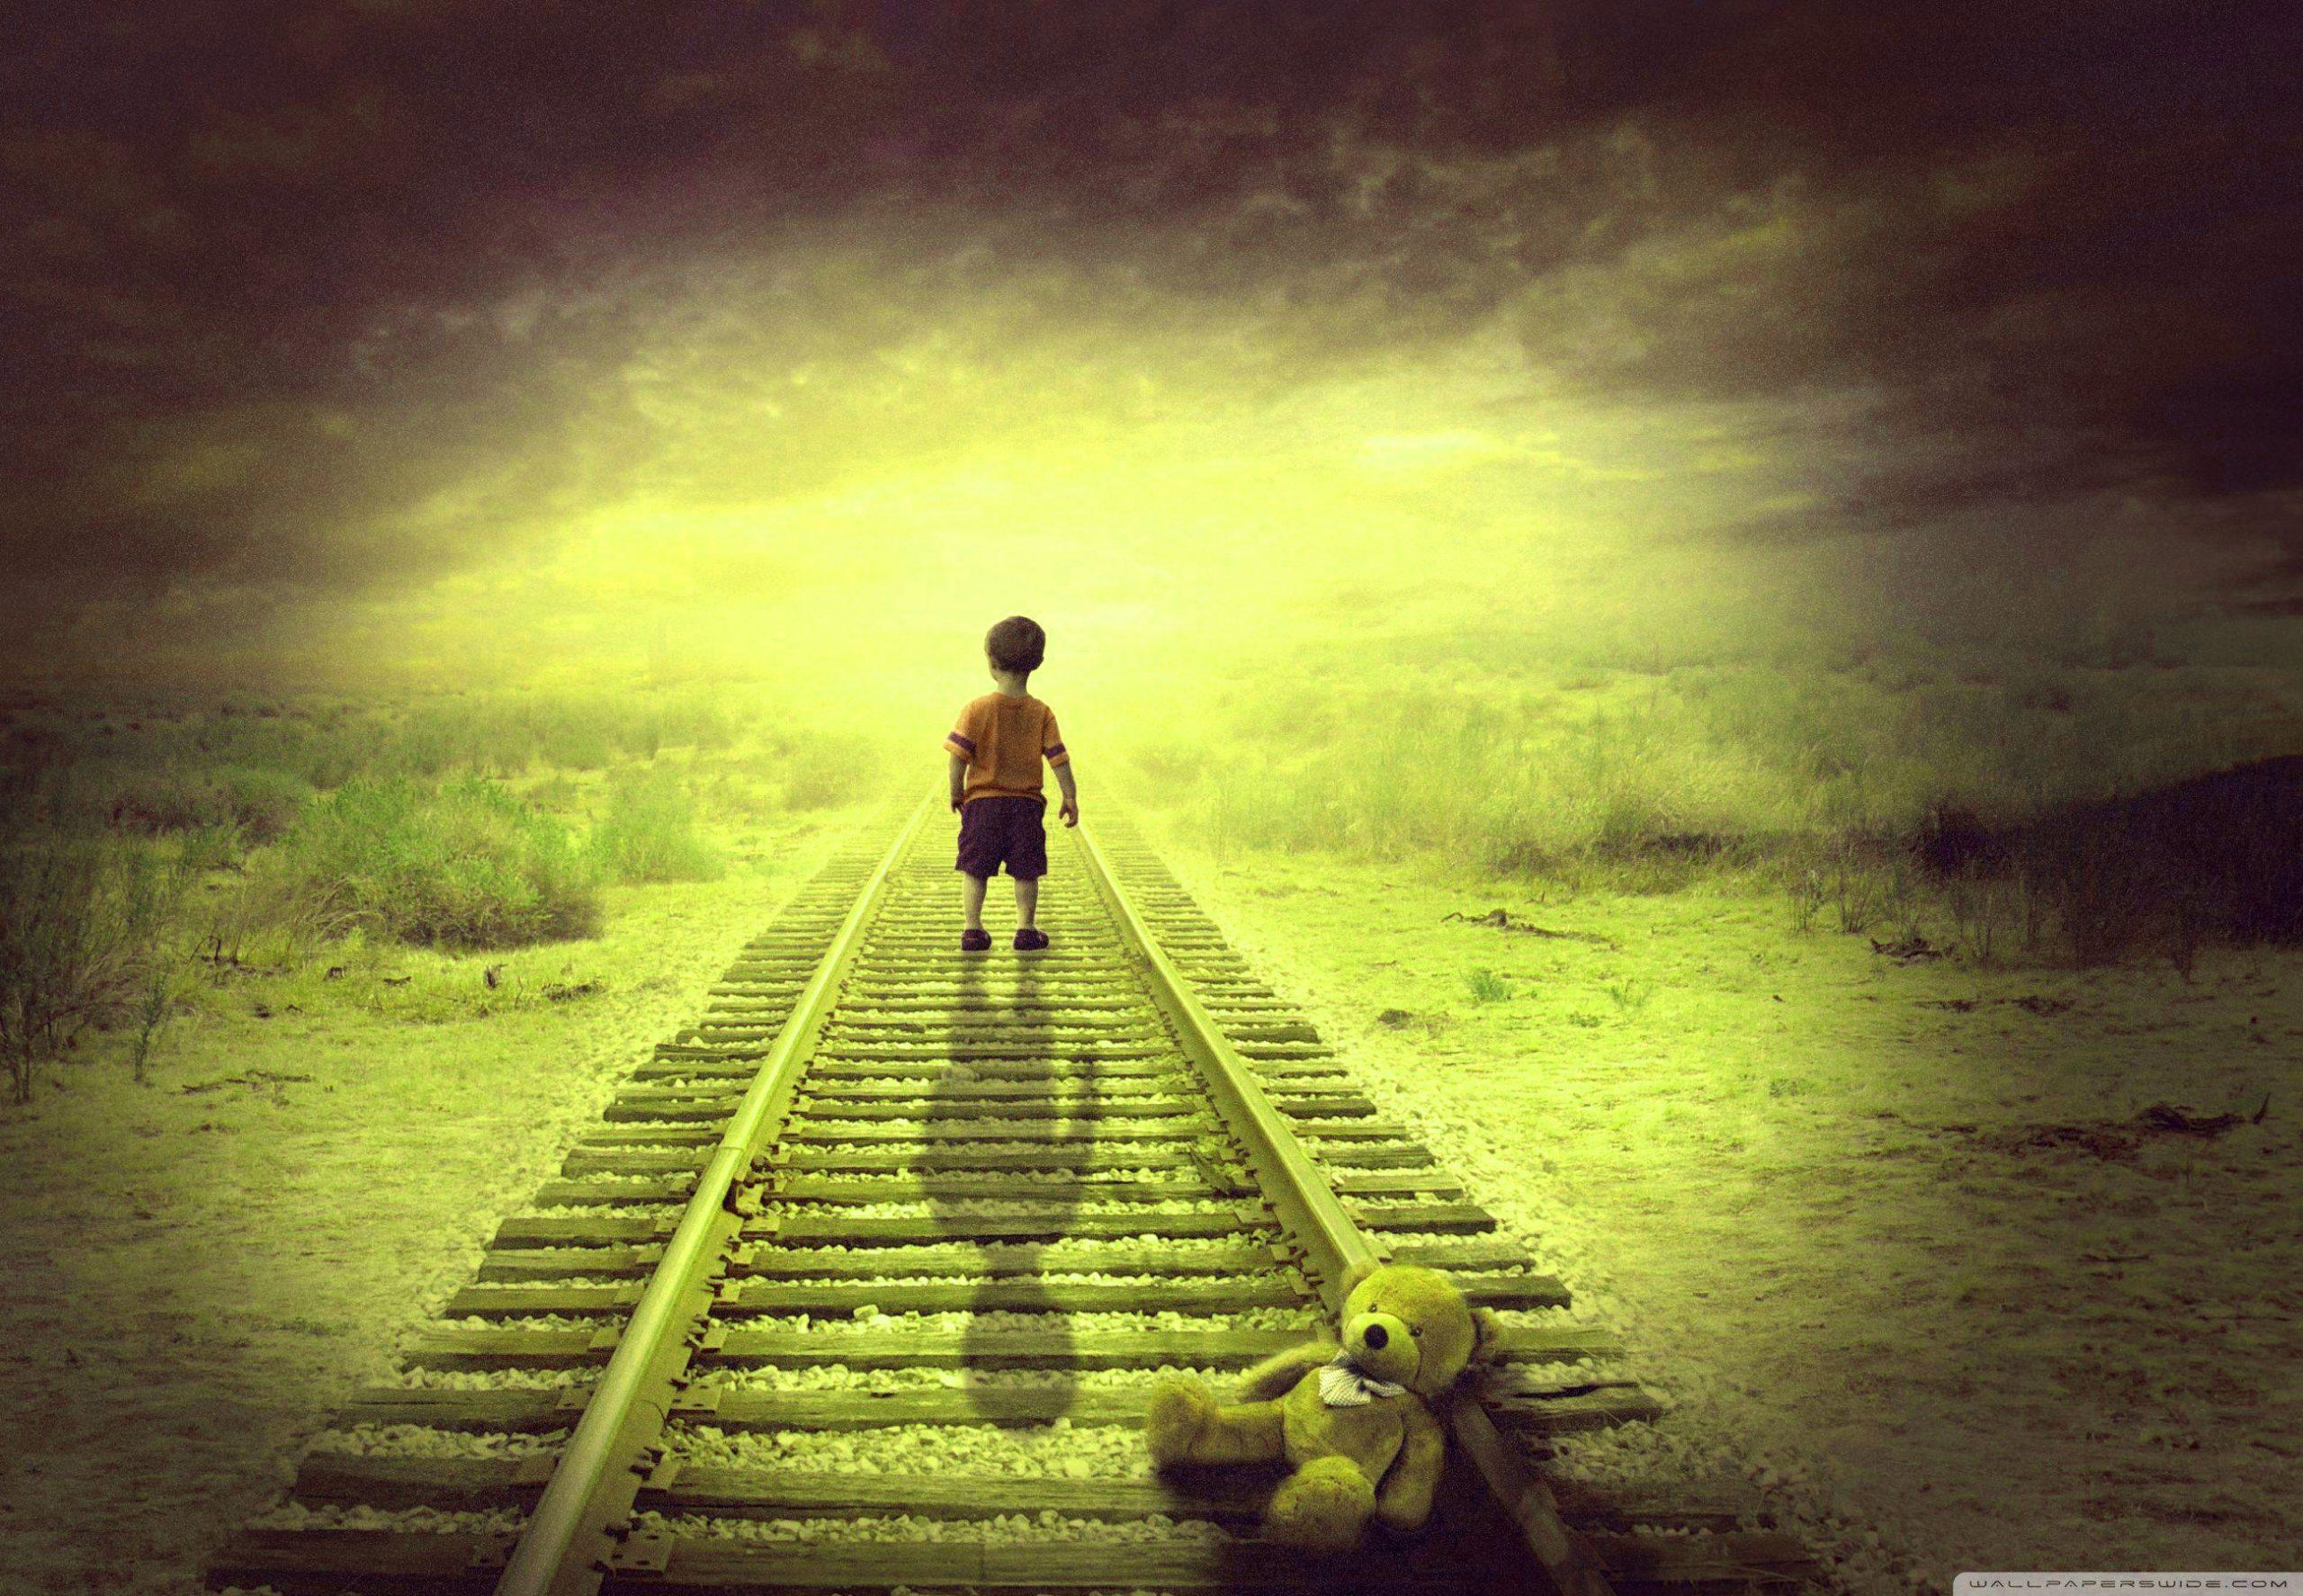 Sad Alone boy whatsapp dp Photo 2021